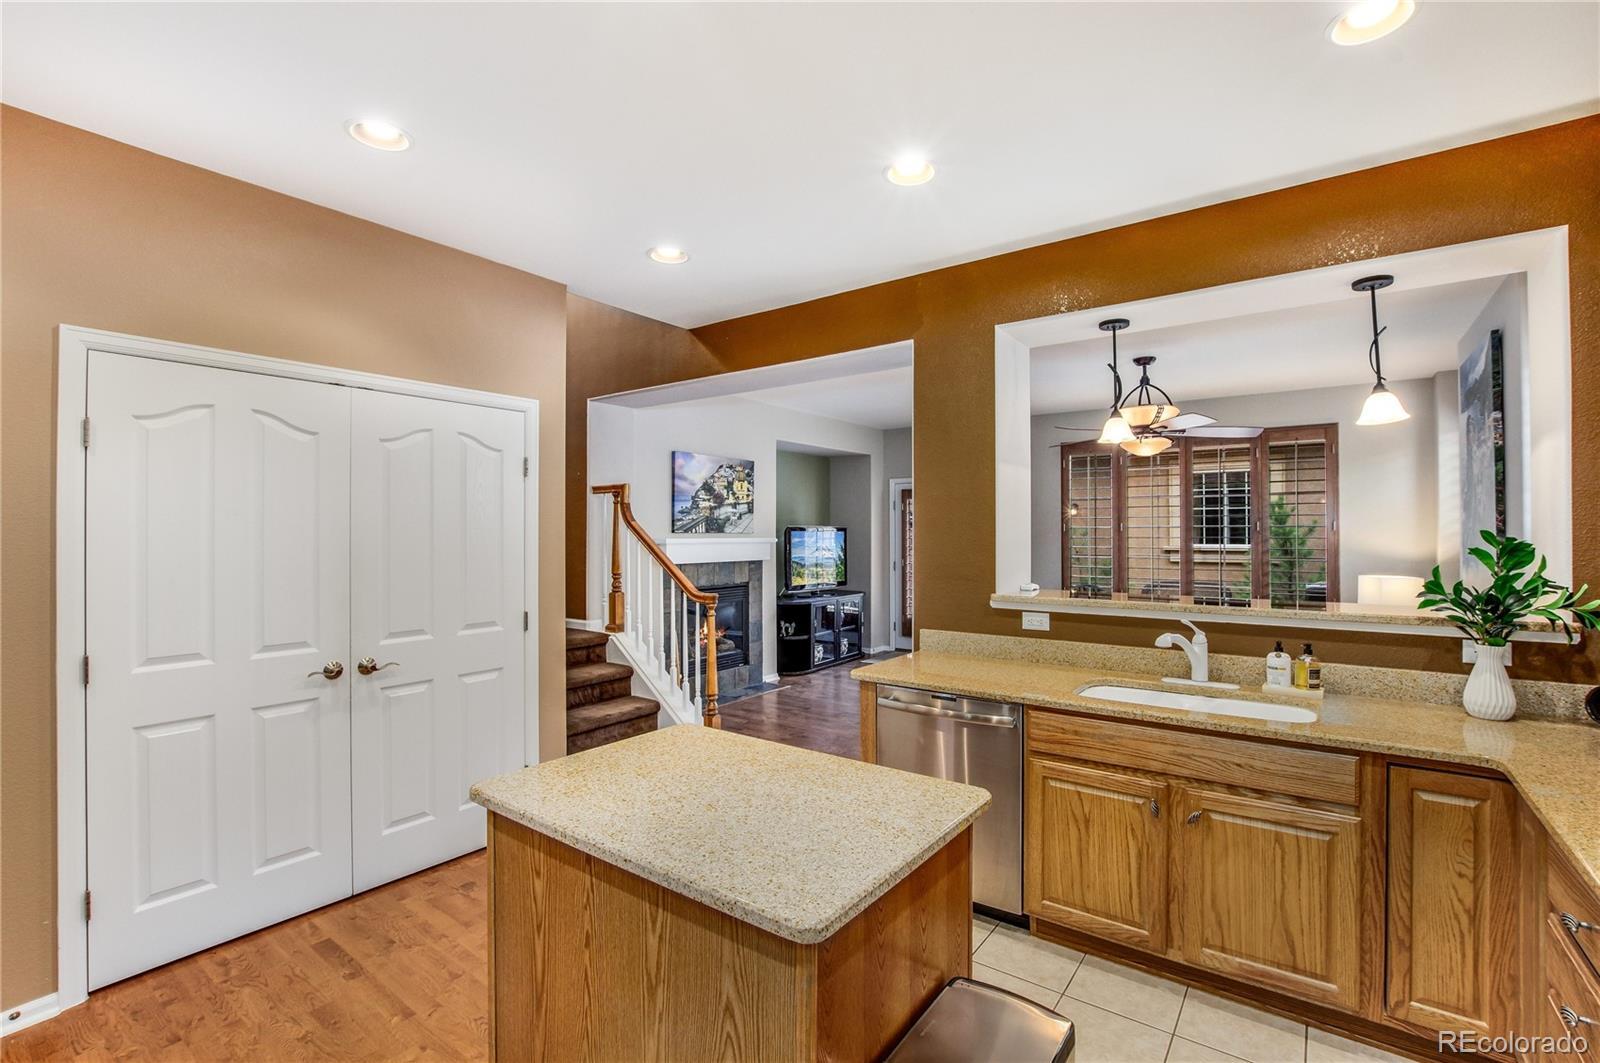 MLS# 5633741 - 14 - 9477 Cedarhurst Lane #A, Highlands Ranch, CO 80129